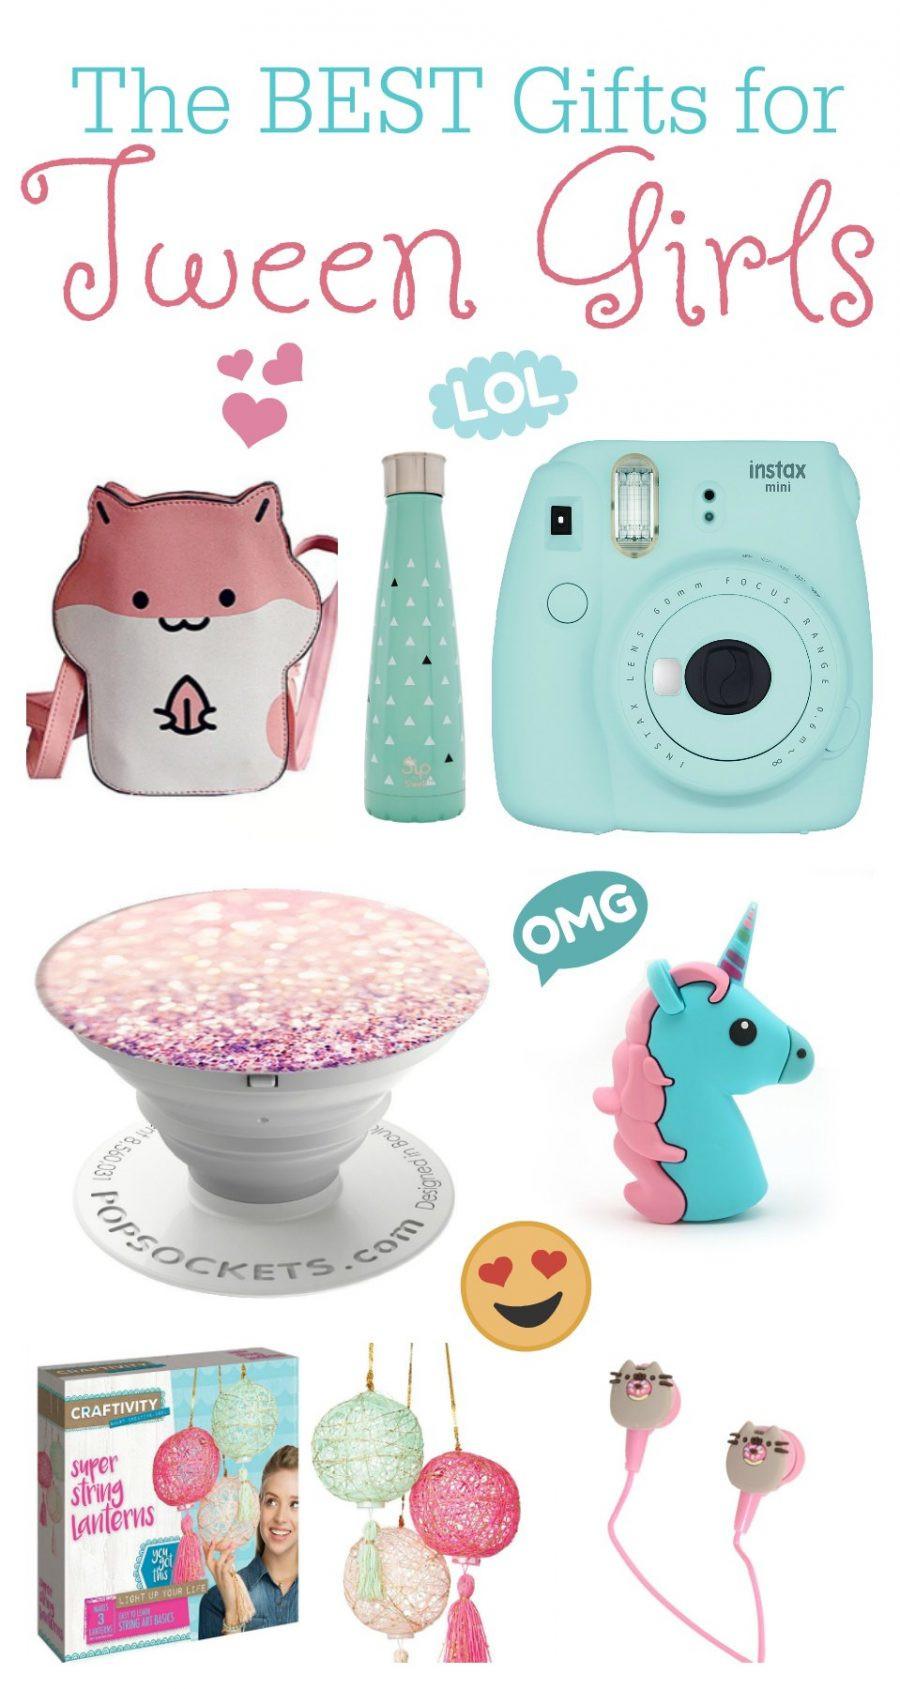 Gift Ideas For Tween Girls  The BEST Gift Ideas for Tween Girls